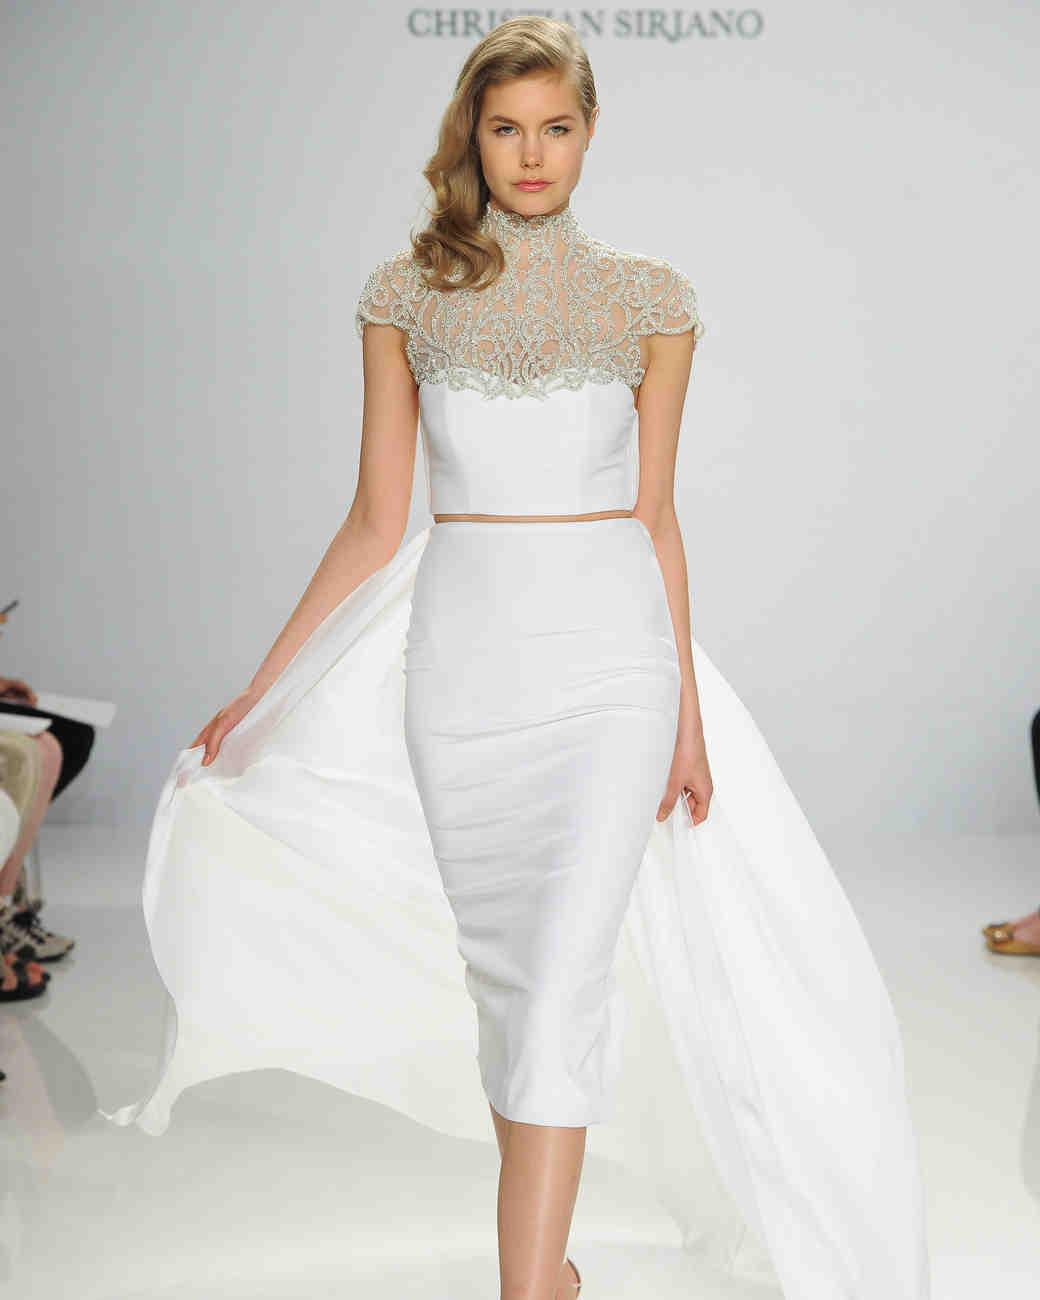 Dress Vegan shoes, Short Casual wedding dresses pictures